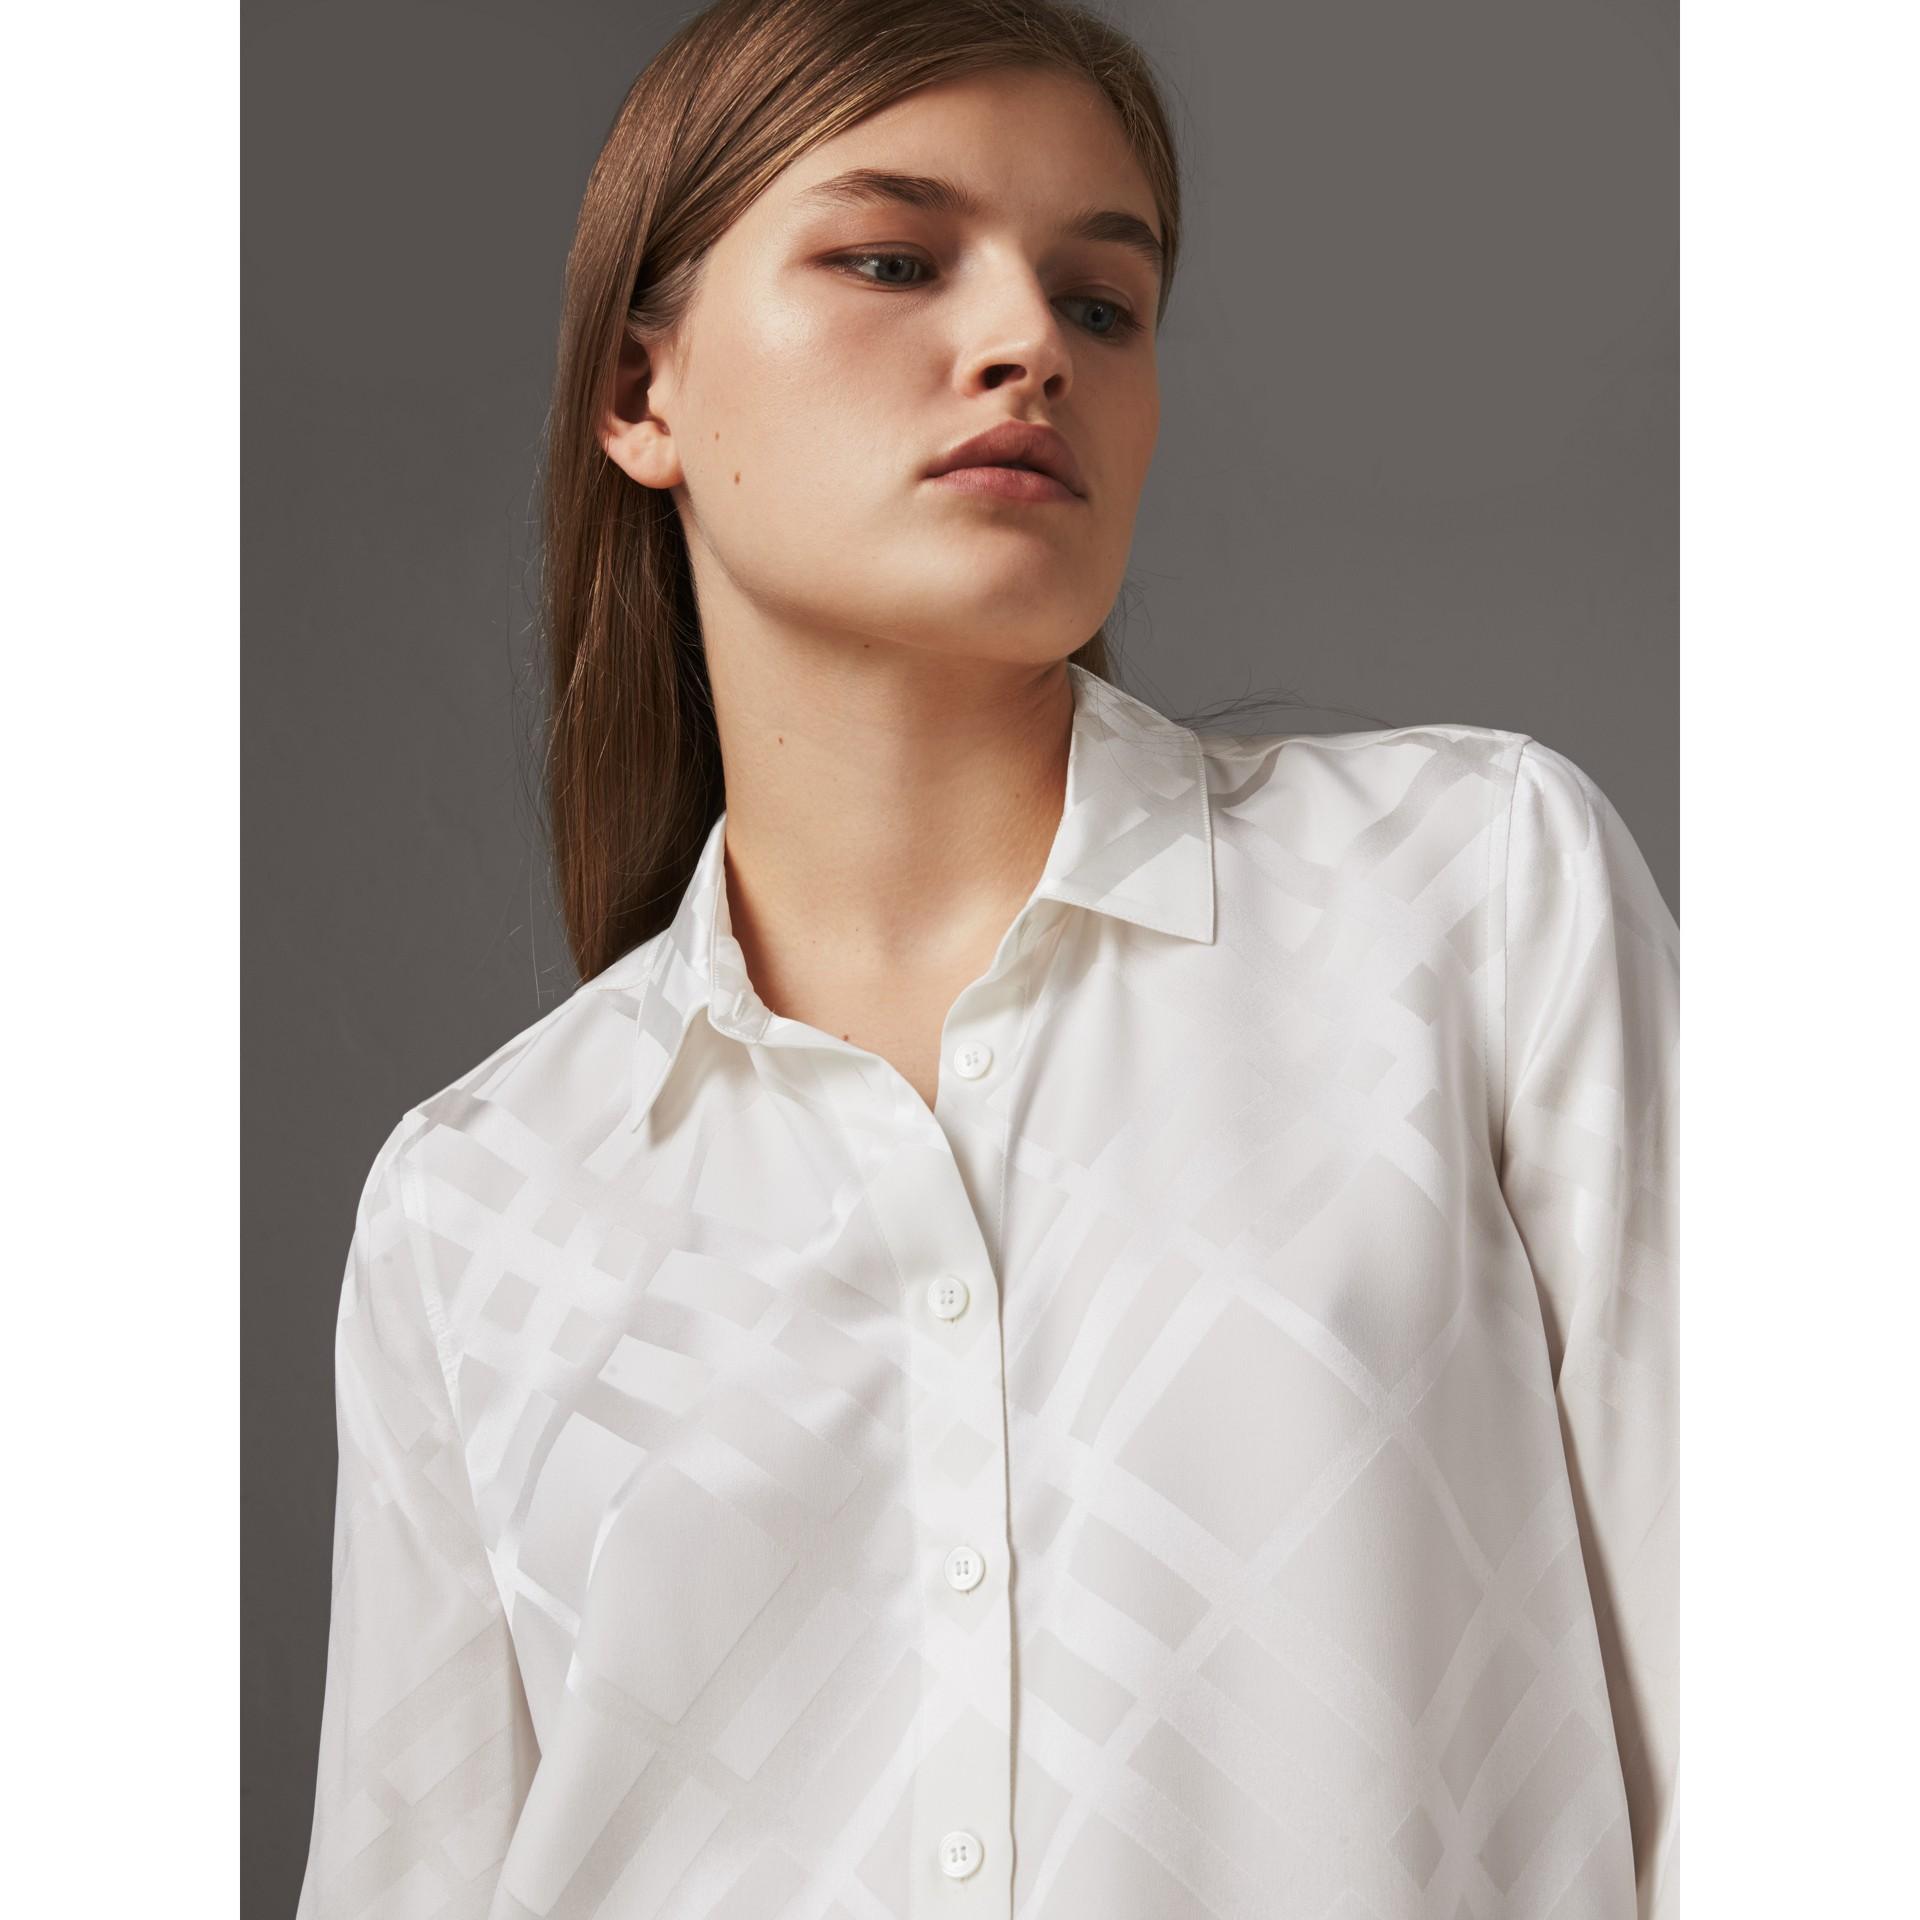 Tonal Check Silk Shirt in White - Women | Burberry Australia - gallery image 2